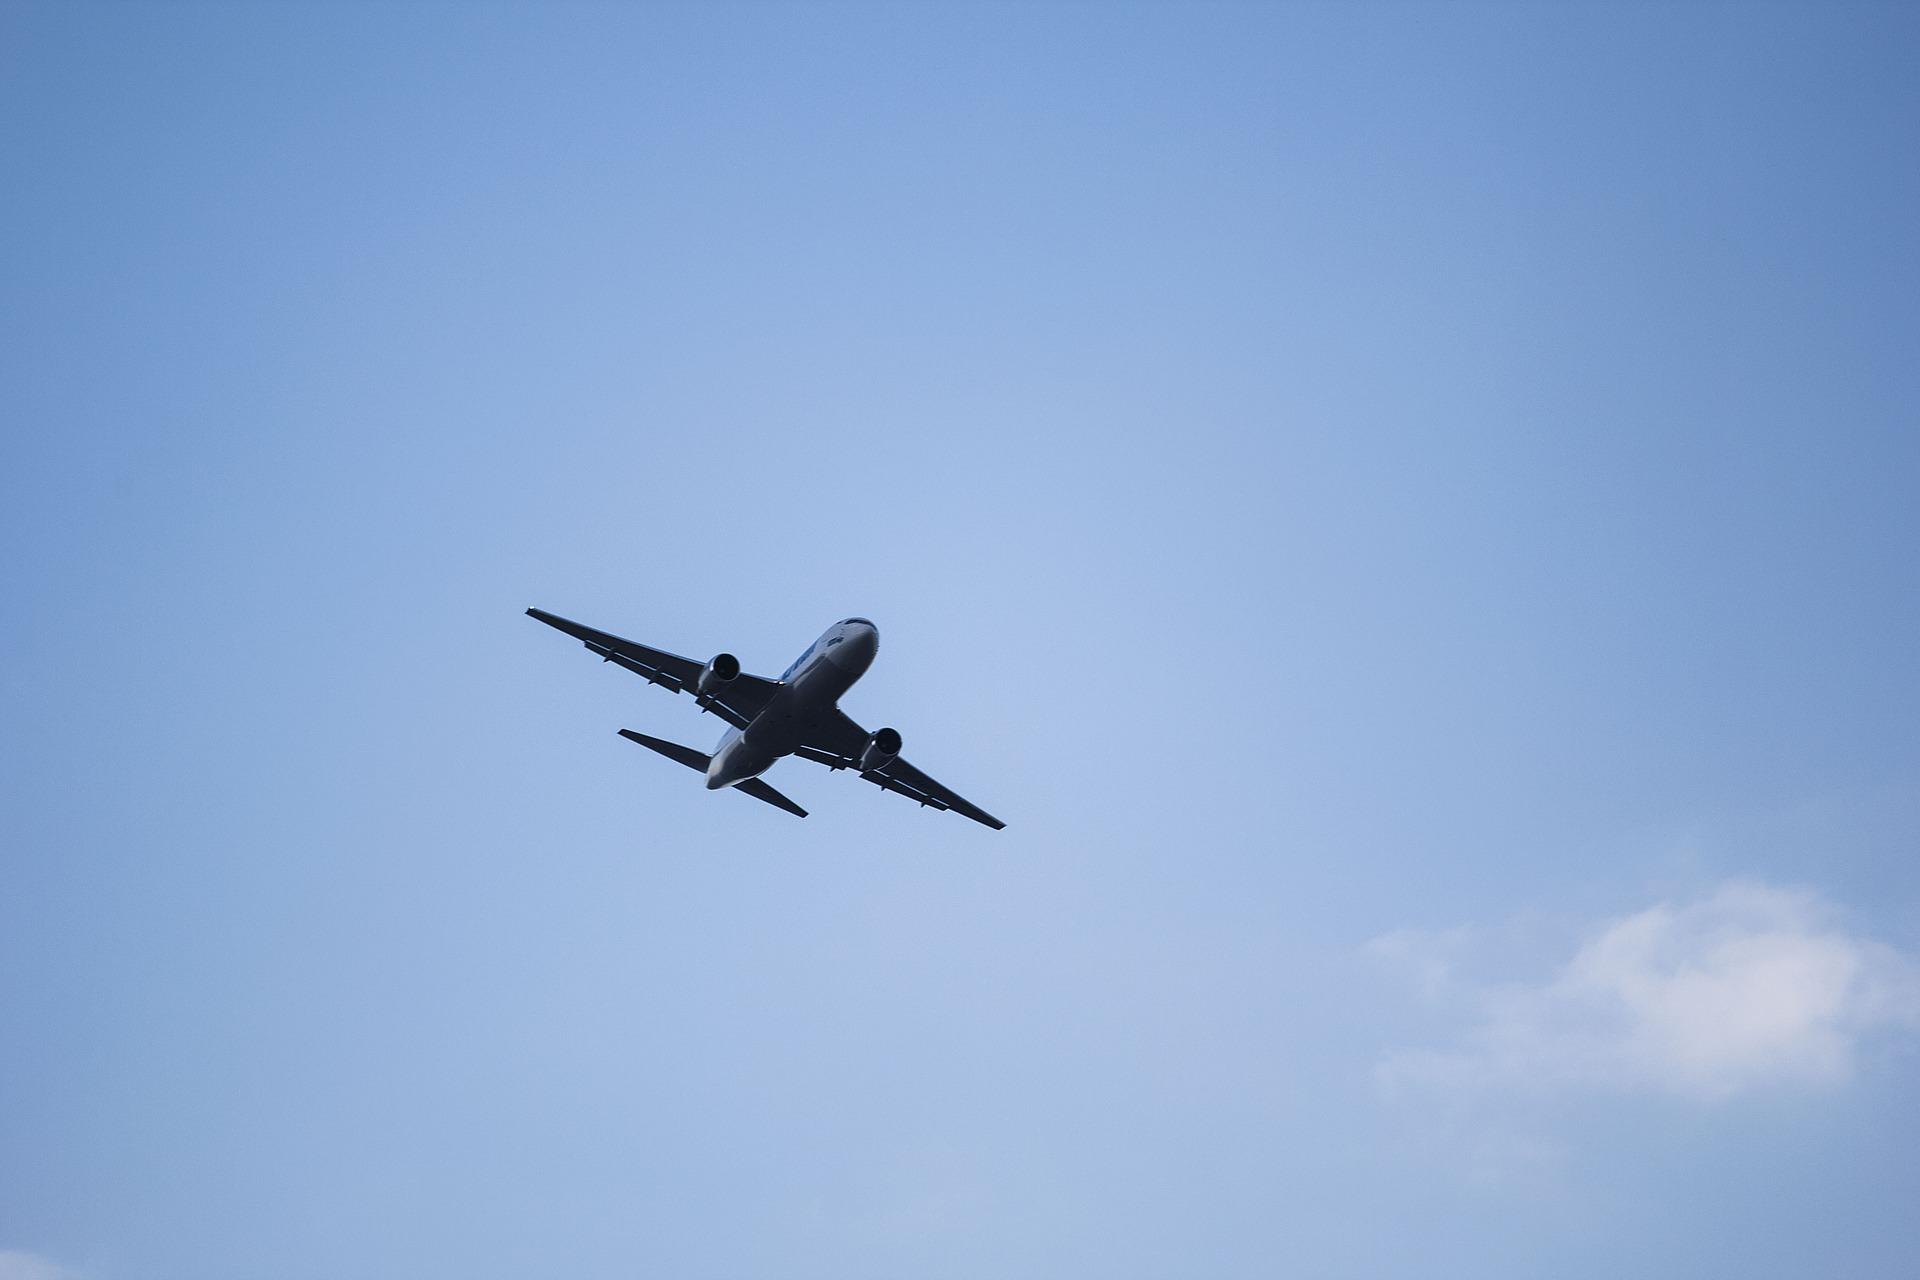 plane-1712737_1920.jpg